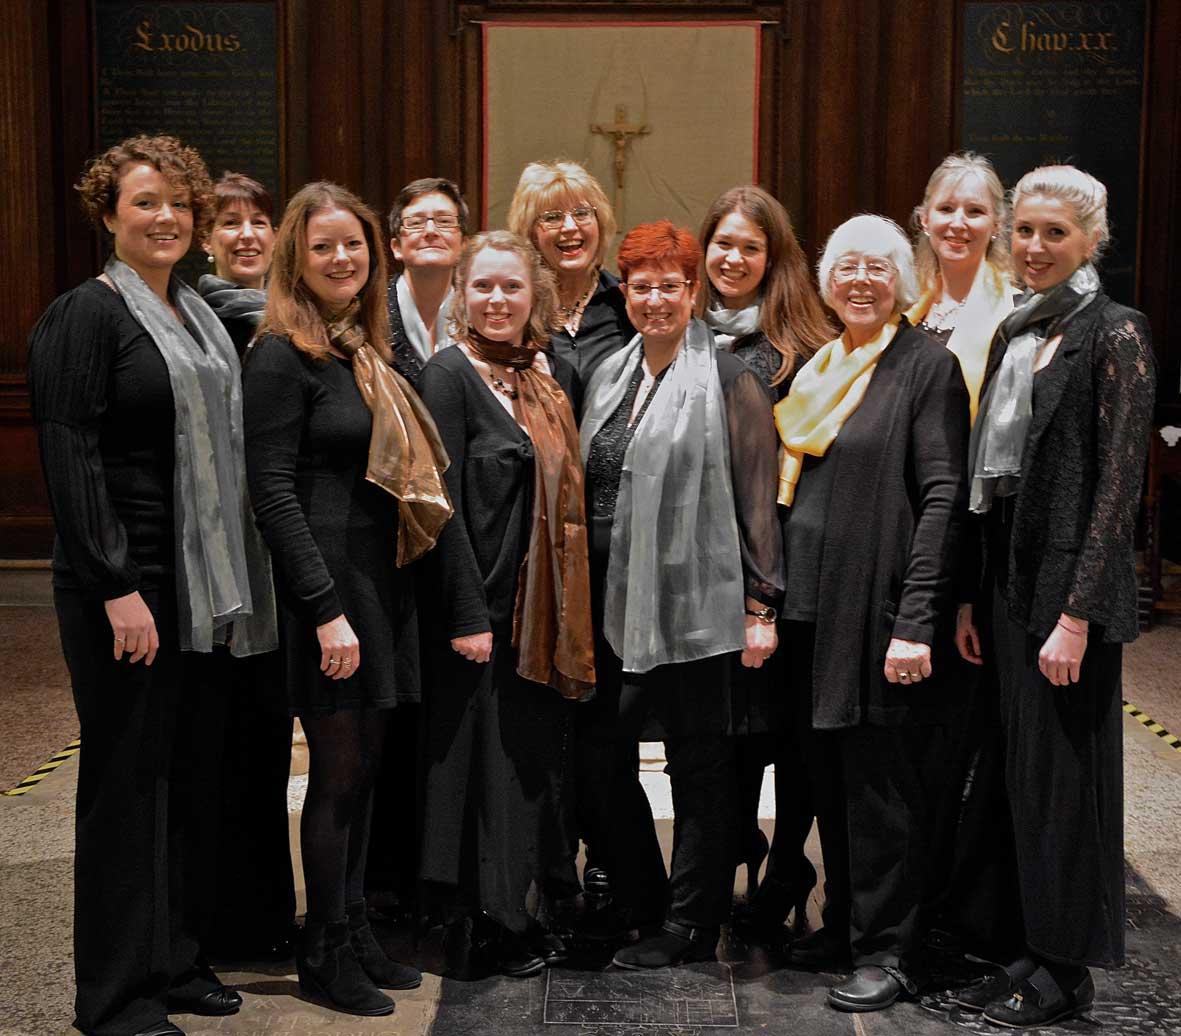 seraphim female voices ensemble